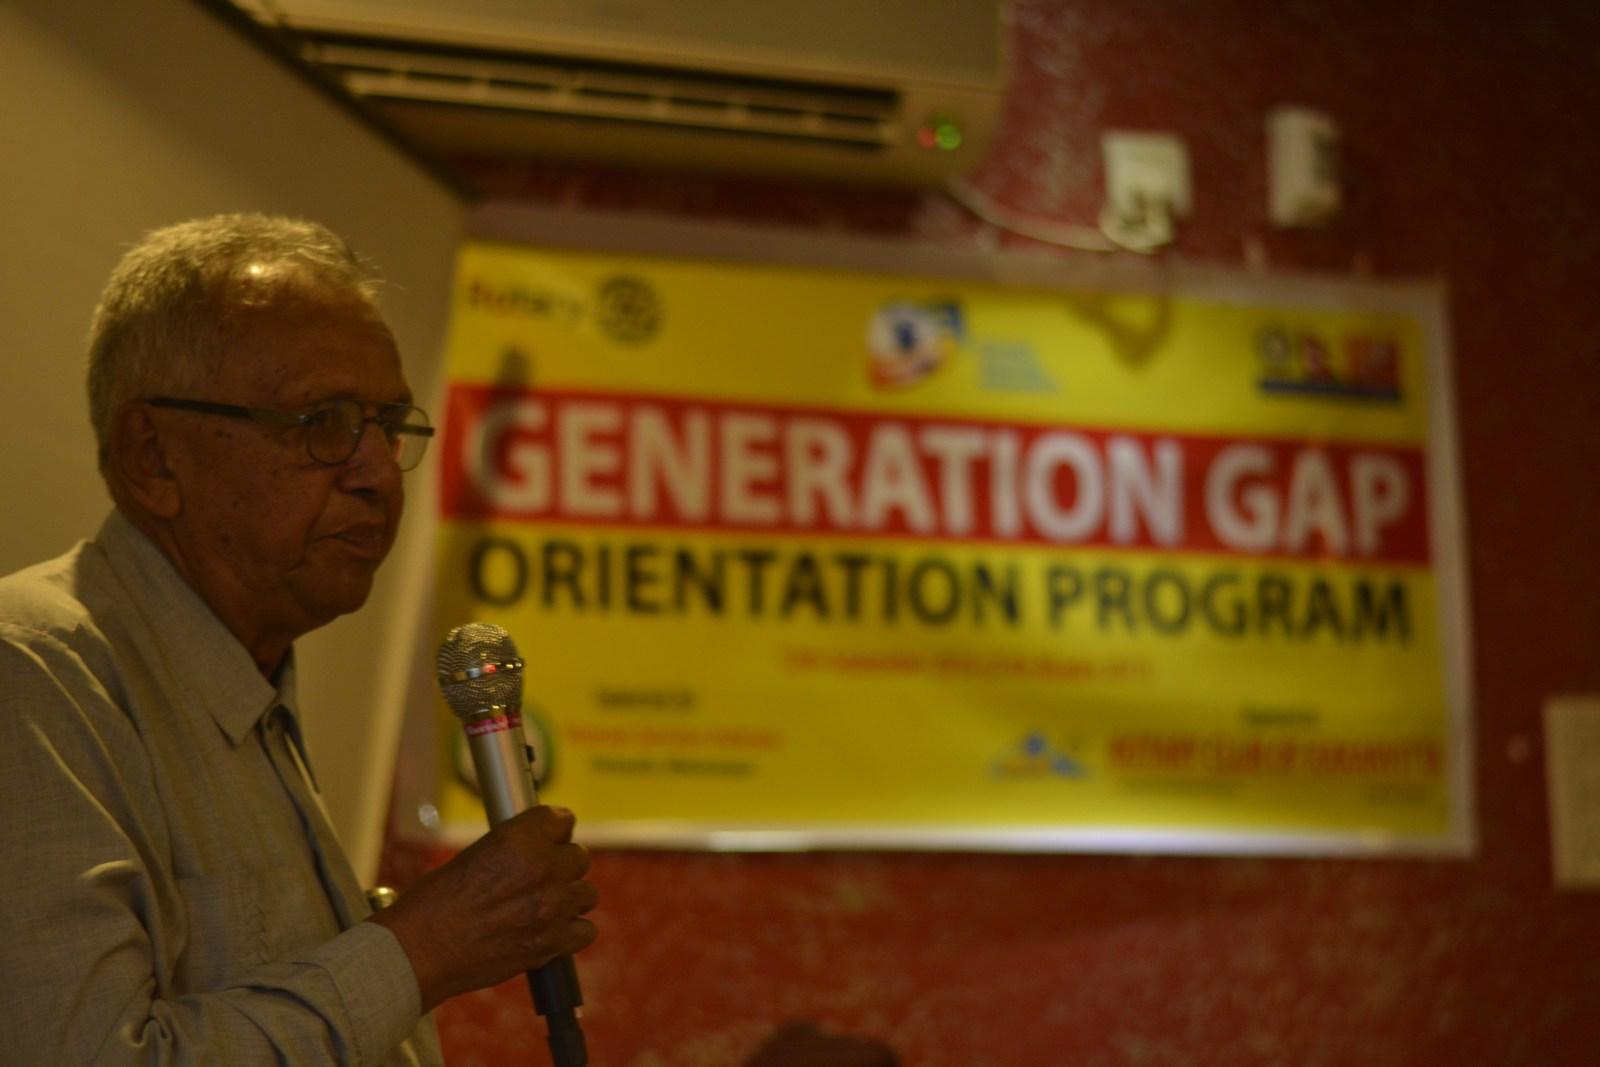 Generation-Gap-Orientation-Program-Rotary-Club-of-Kakarvitta-26